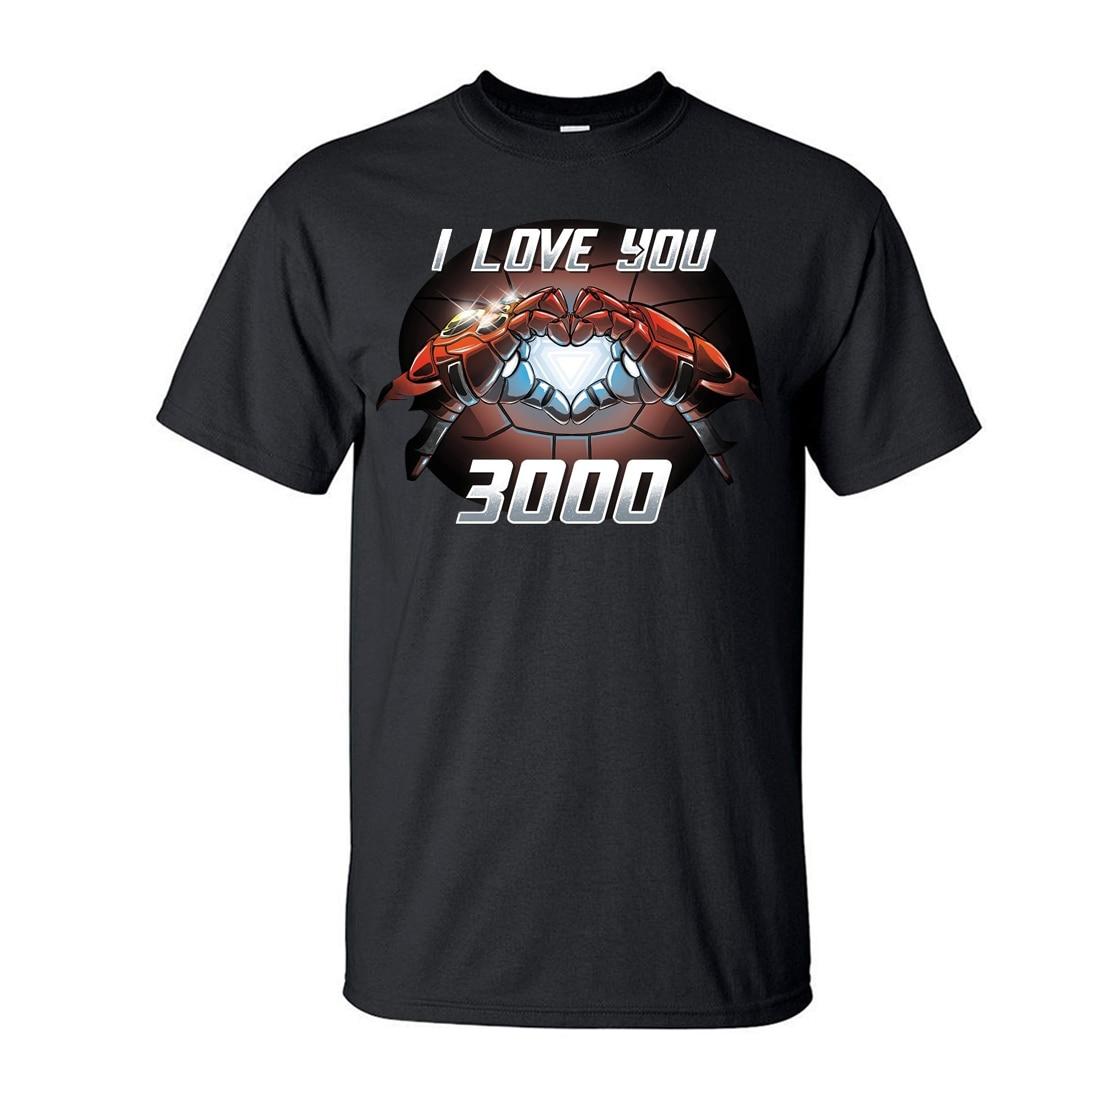 Tony Stark I Love You 3000 T-Shirt Men The Avengers Iron Man Moive Shirt 2019 New Summer Casual Plus Size Tops Tees S-3XL